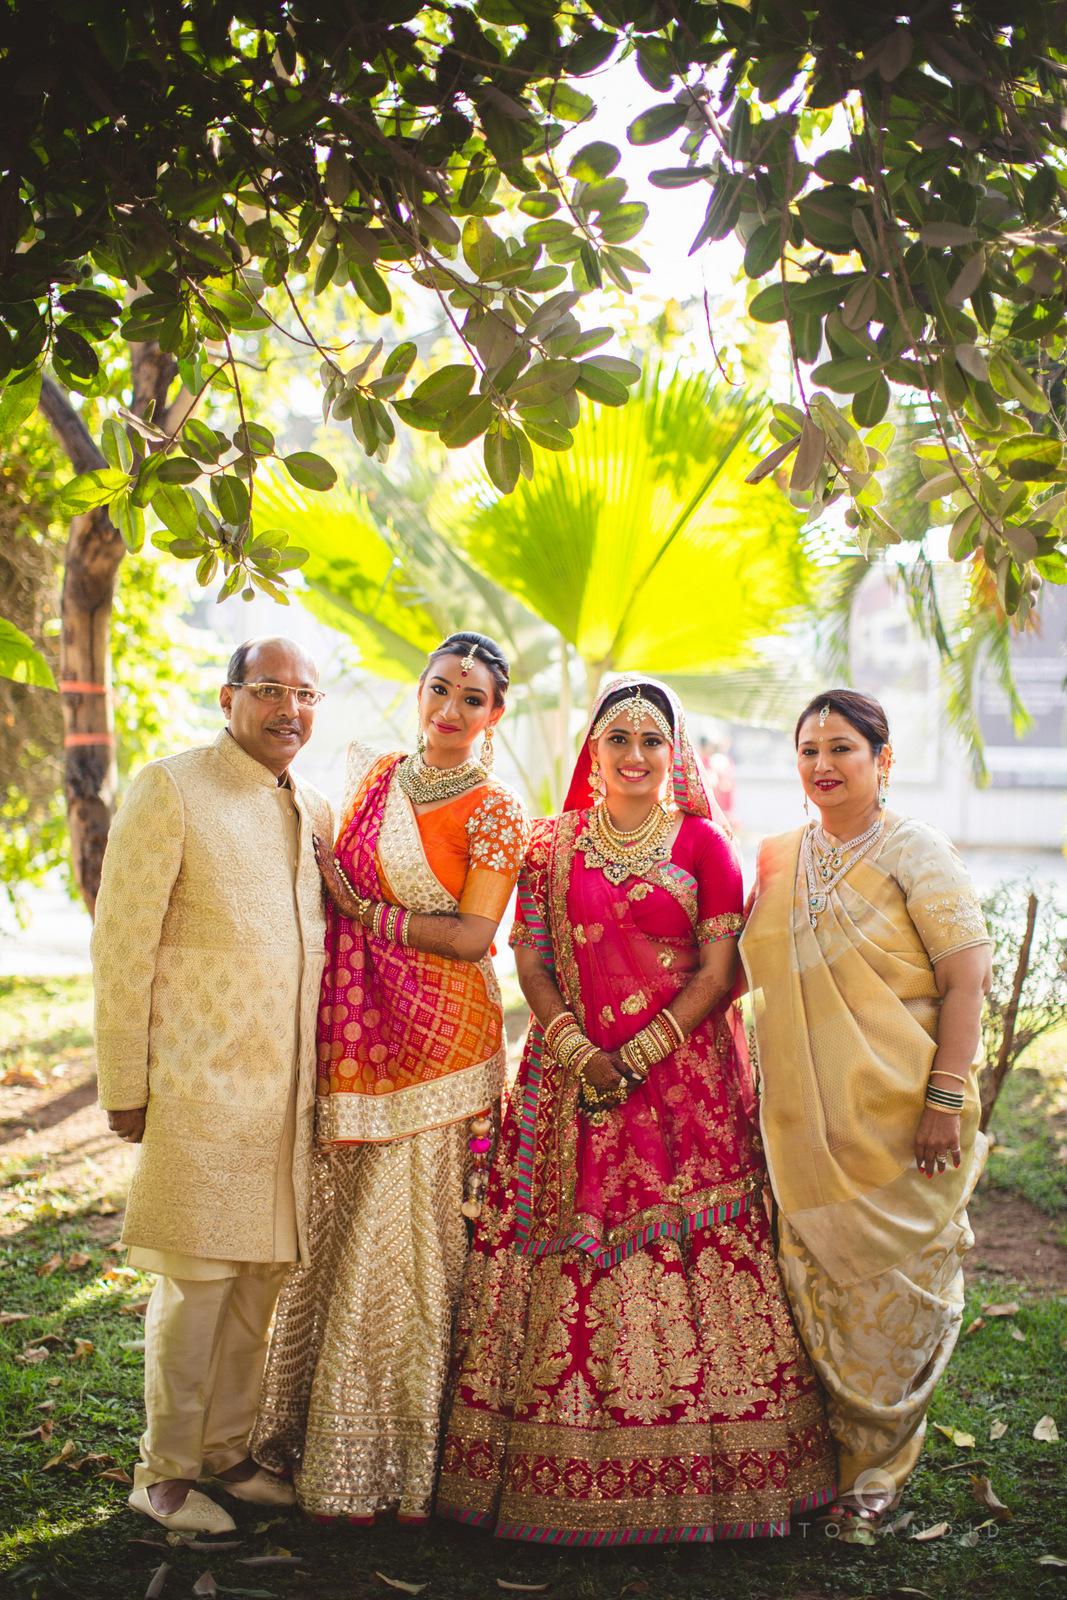 mumbai-gujarati-wedding-photographer-intocandid-photography-tg-028.jpg